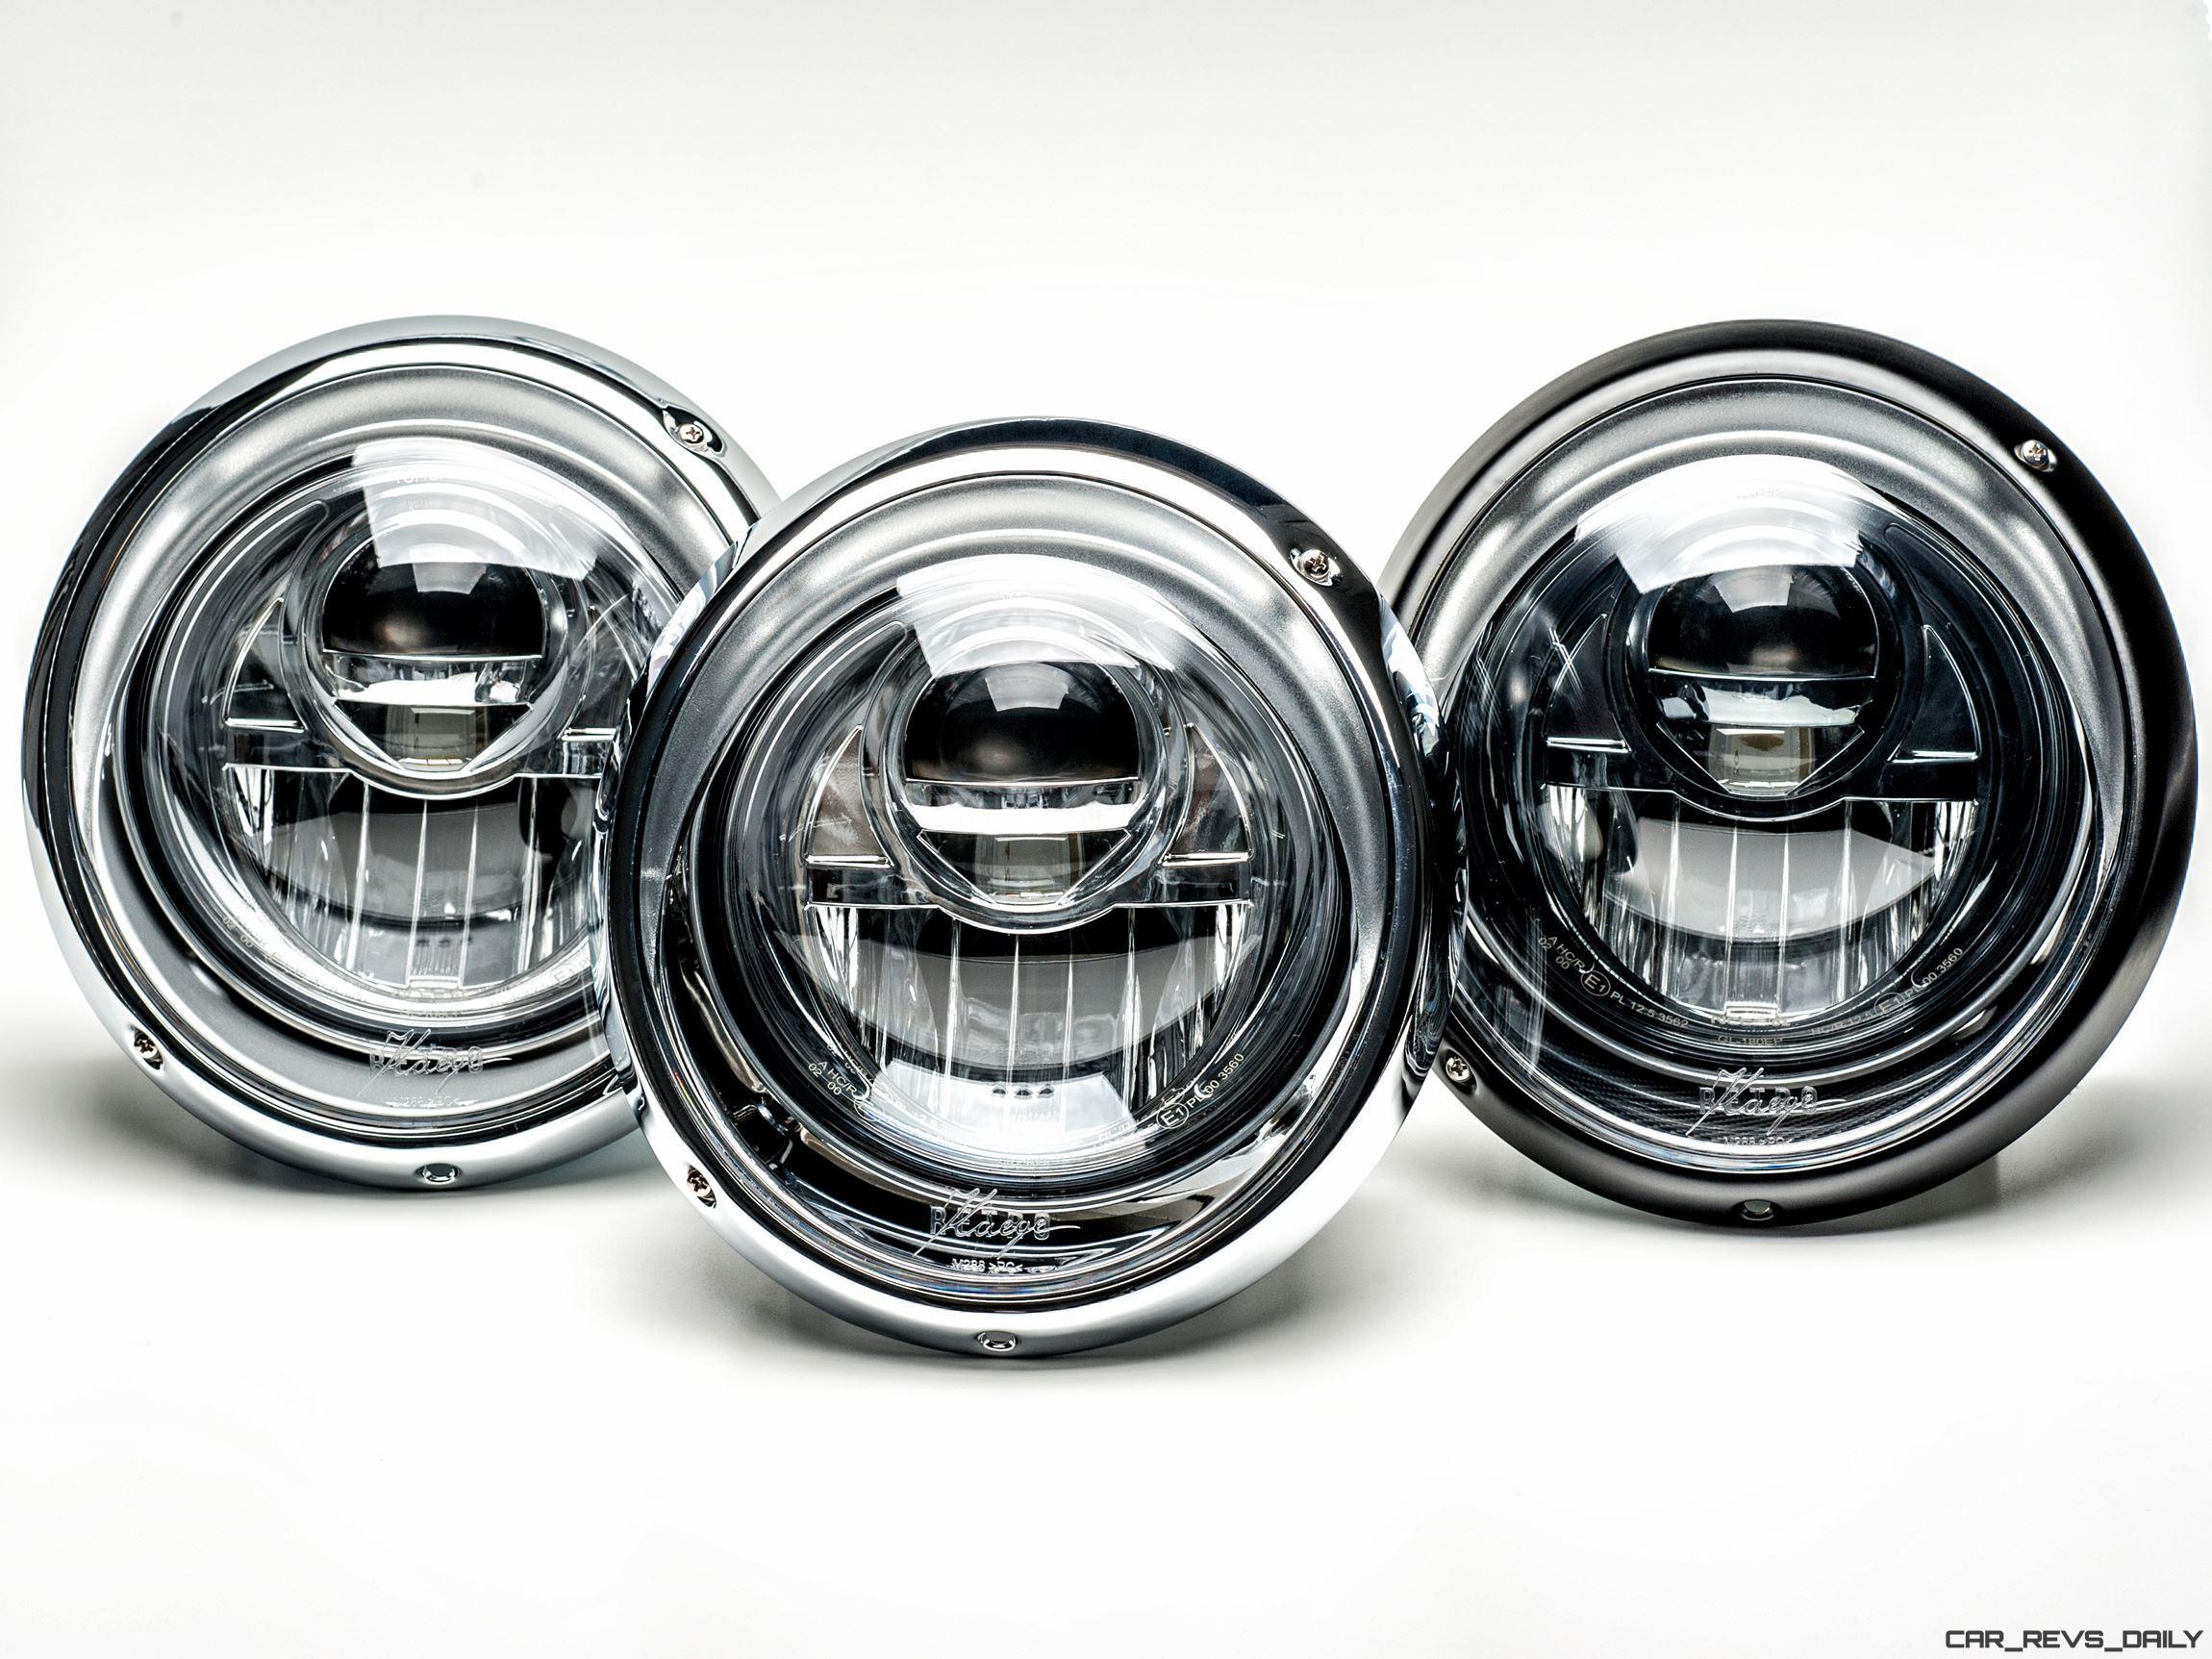 reveals led projector headlamps for classic 911s even carbon optics and black chrome. Black Bedroom Furniture Sets. Home Design Ideas